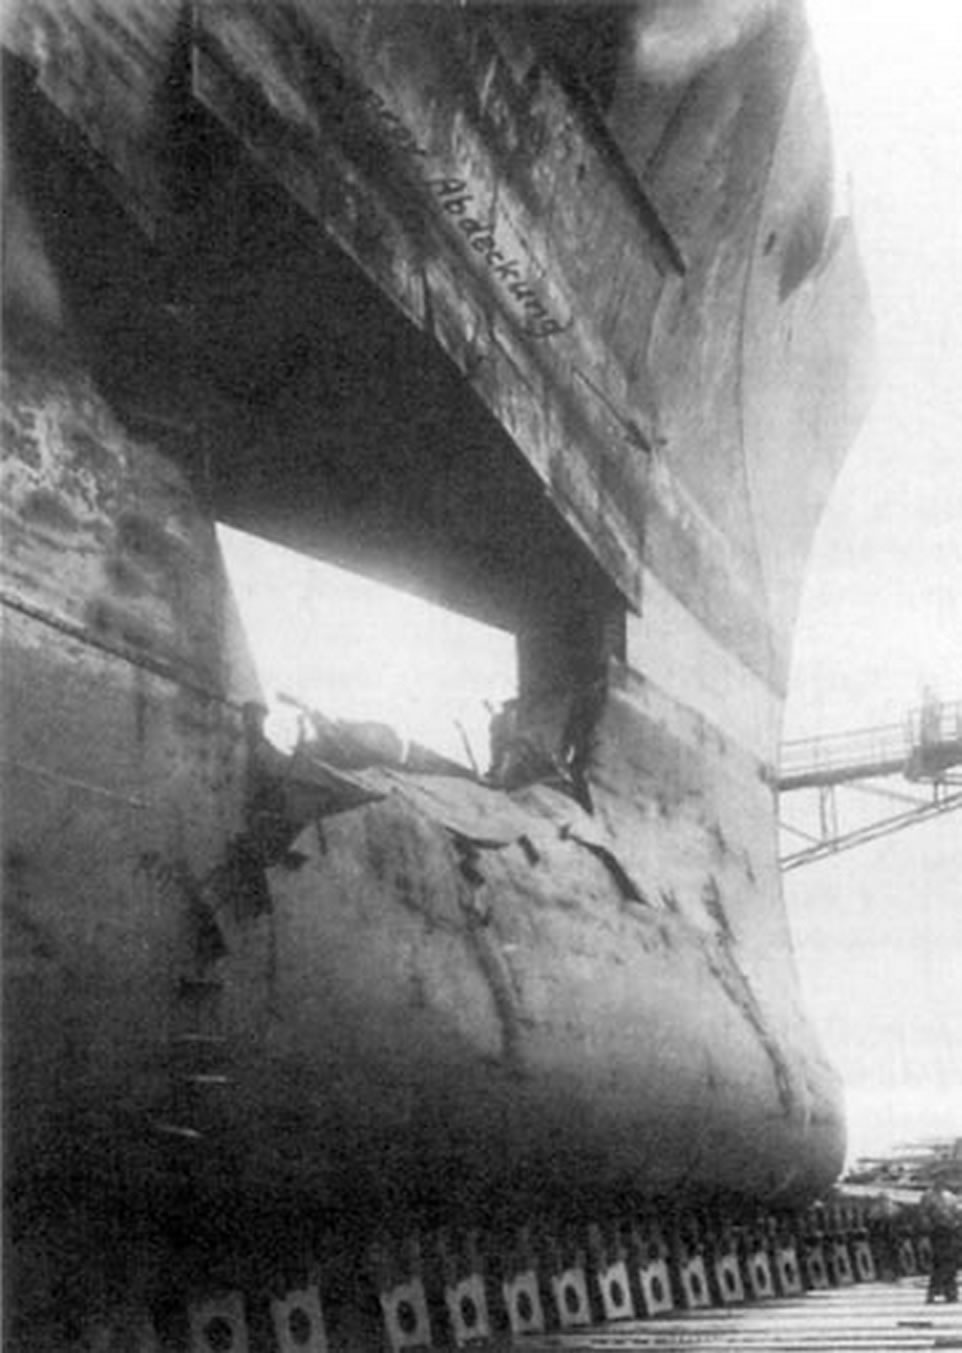 Kriegsmarine battleship KMS Gneisenau during operation Juno 03